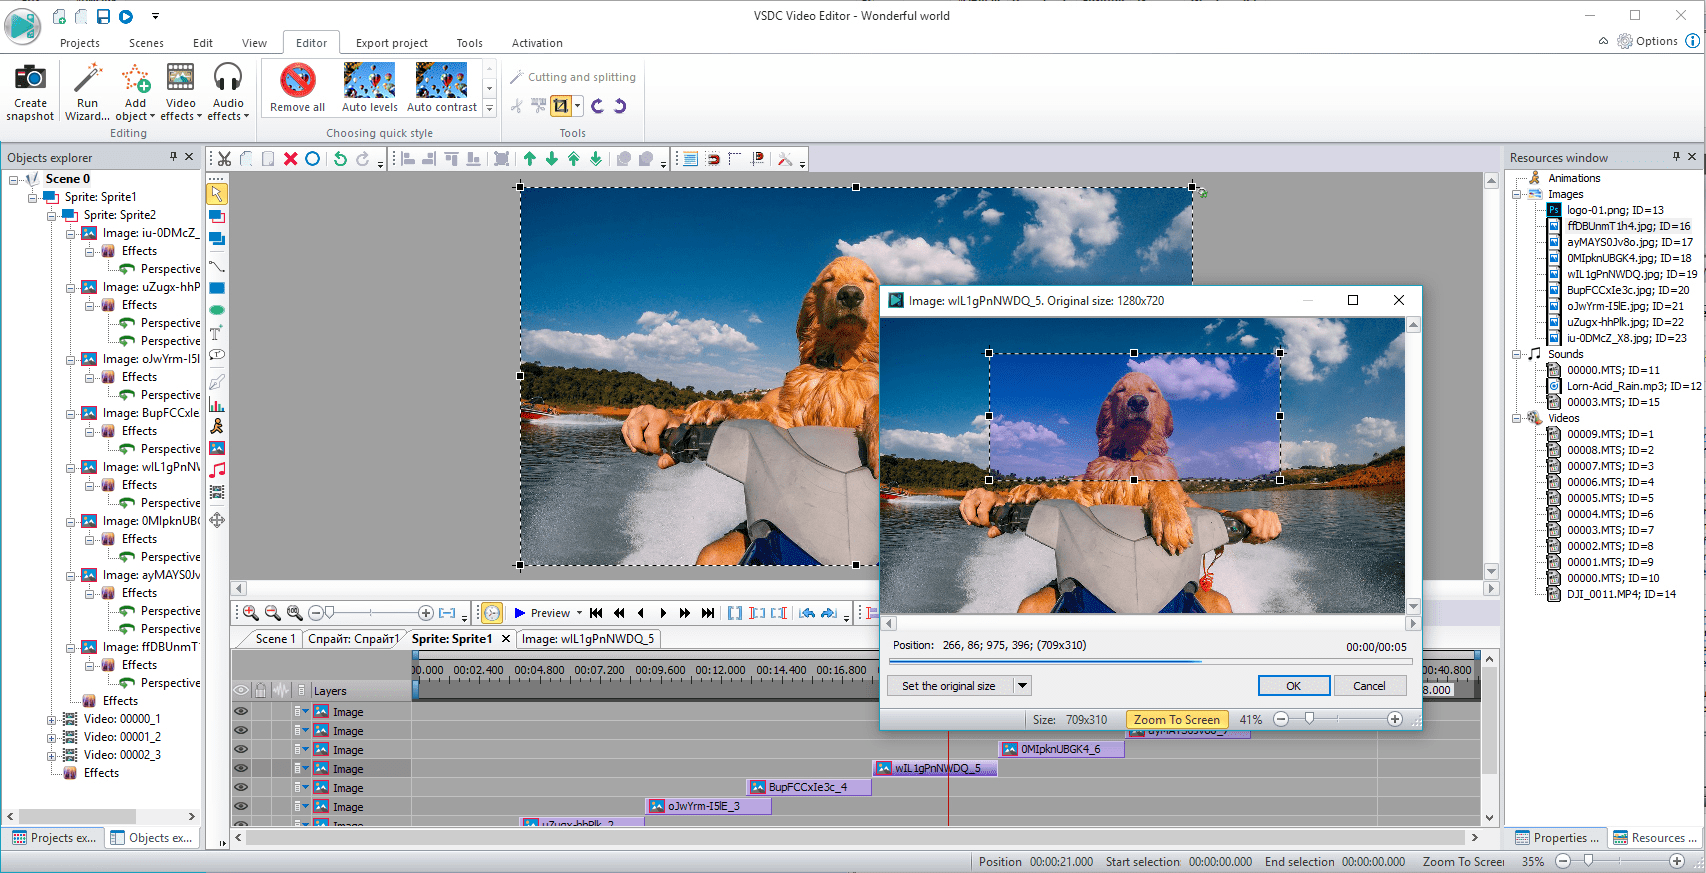 vsdc-free-video-editor-screenshot.jpg